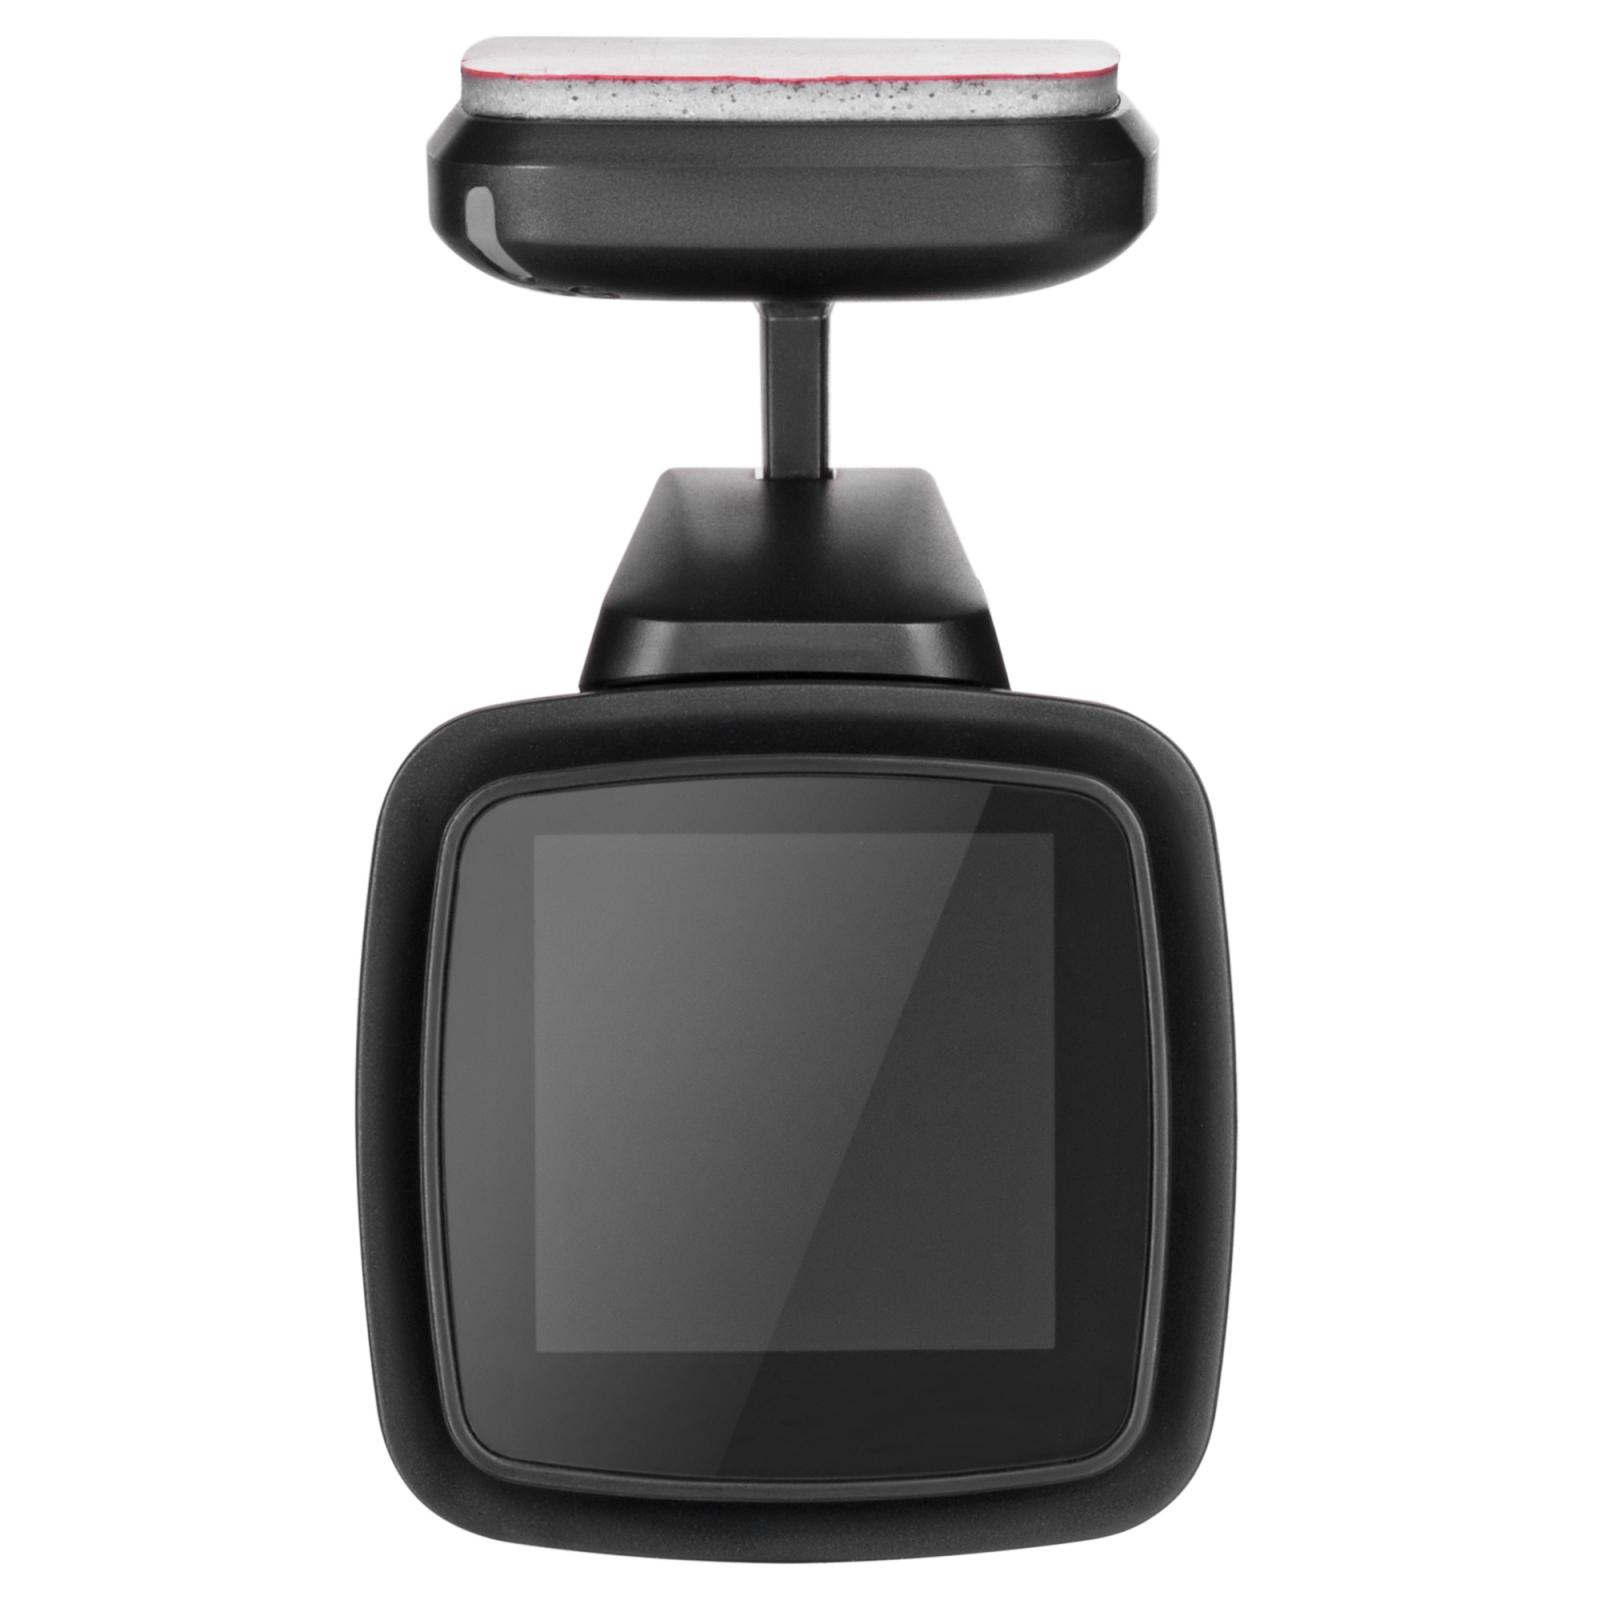 Відеореєстратор 2E Drive 550 Magnet (2E-DRIVE550MAGNET) зображення 5